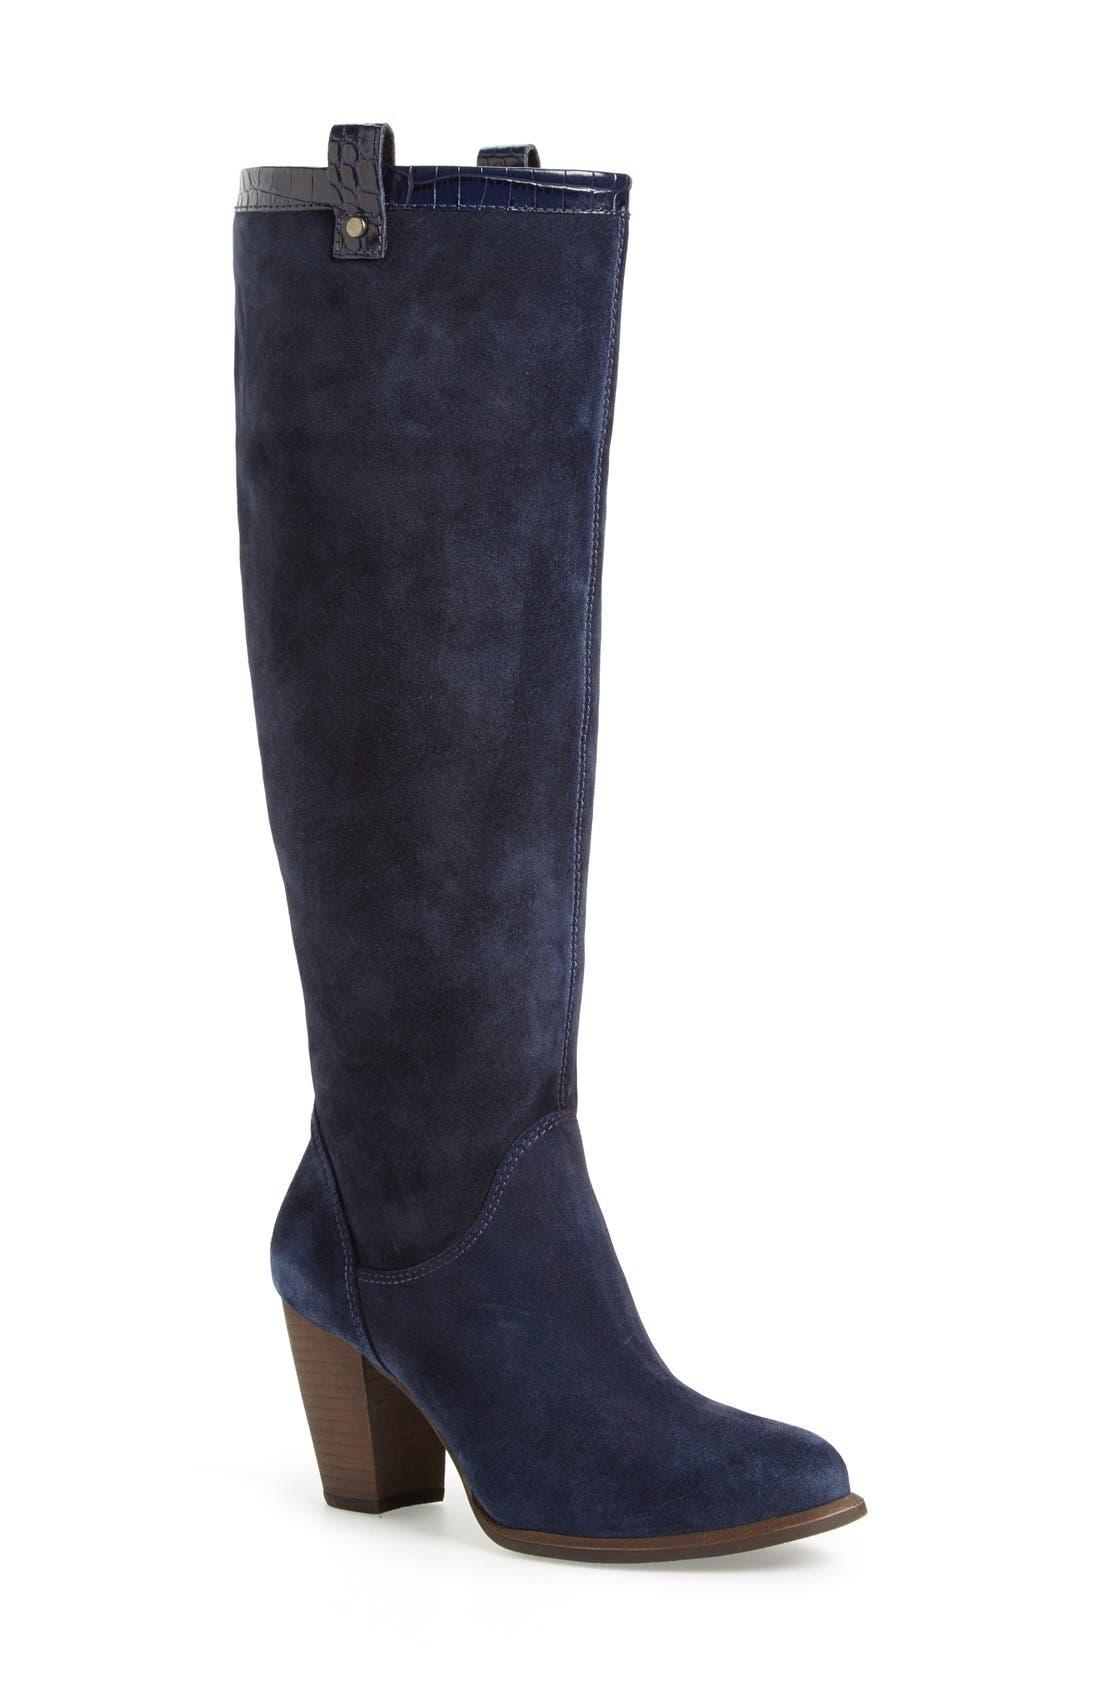 Main Image - UGG® 'Ava Croco' Tall Suede Boot (Women)